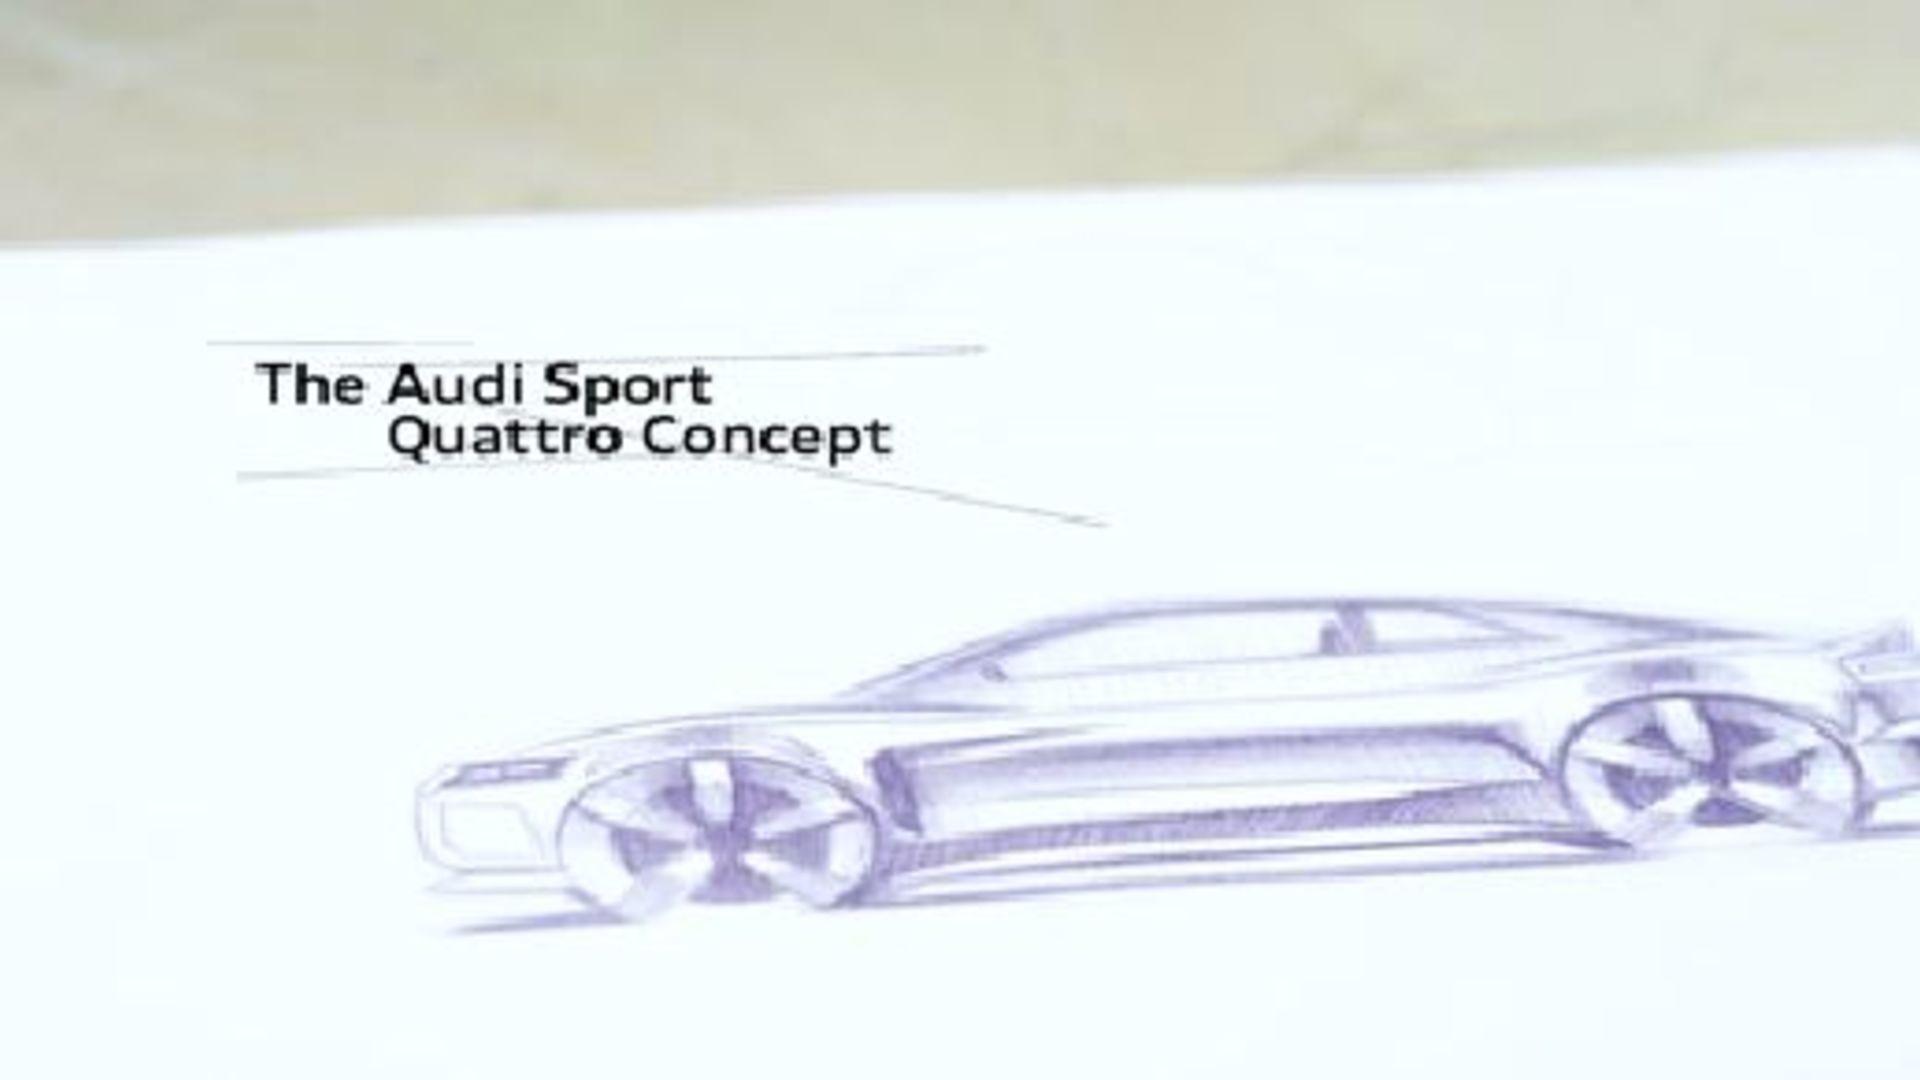 The Progress of Design - Audi sport quattro concept